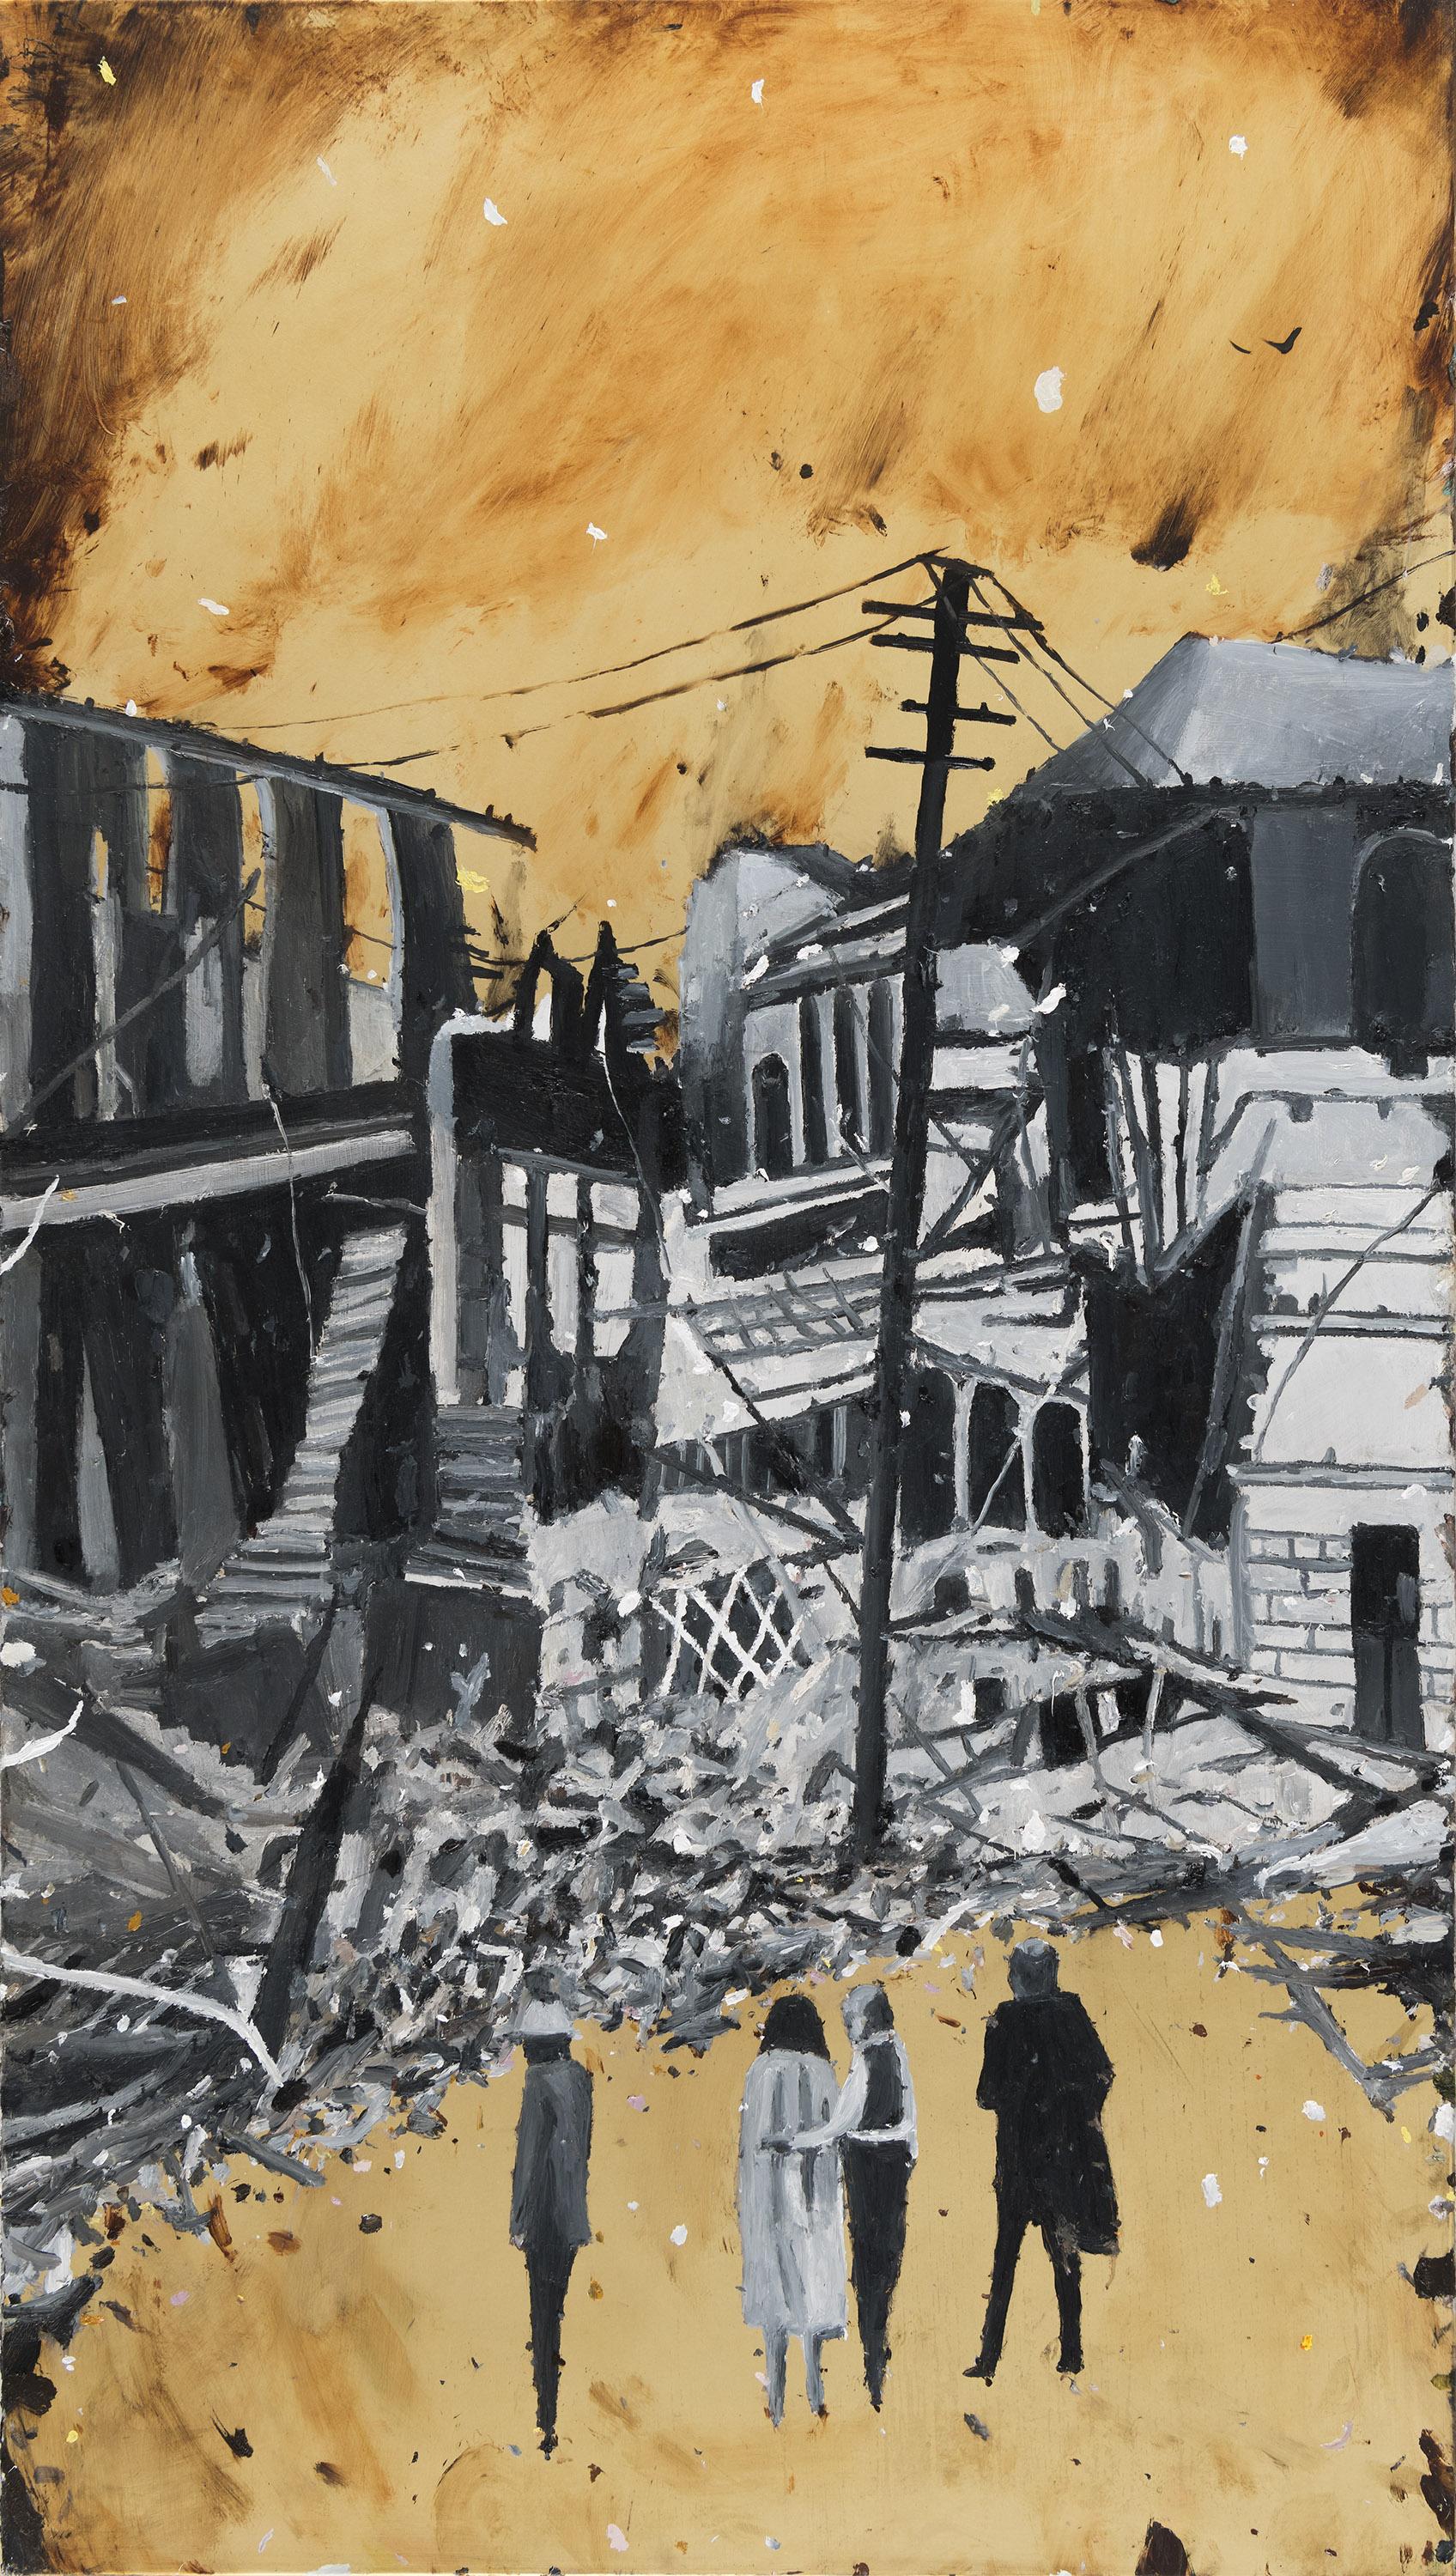 Richard Lewer: Collective Memory